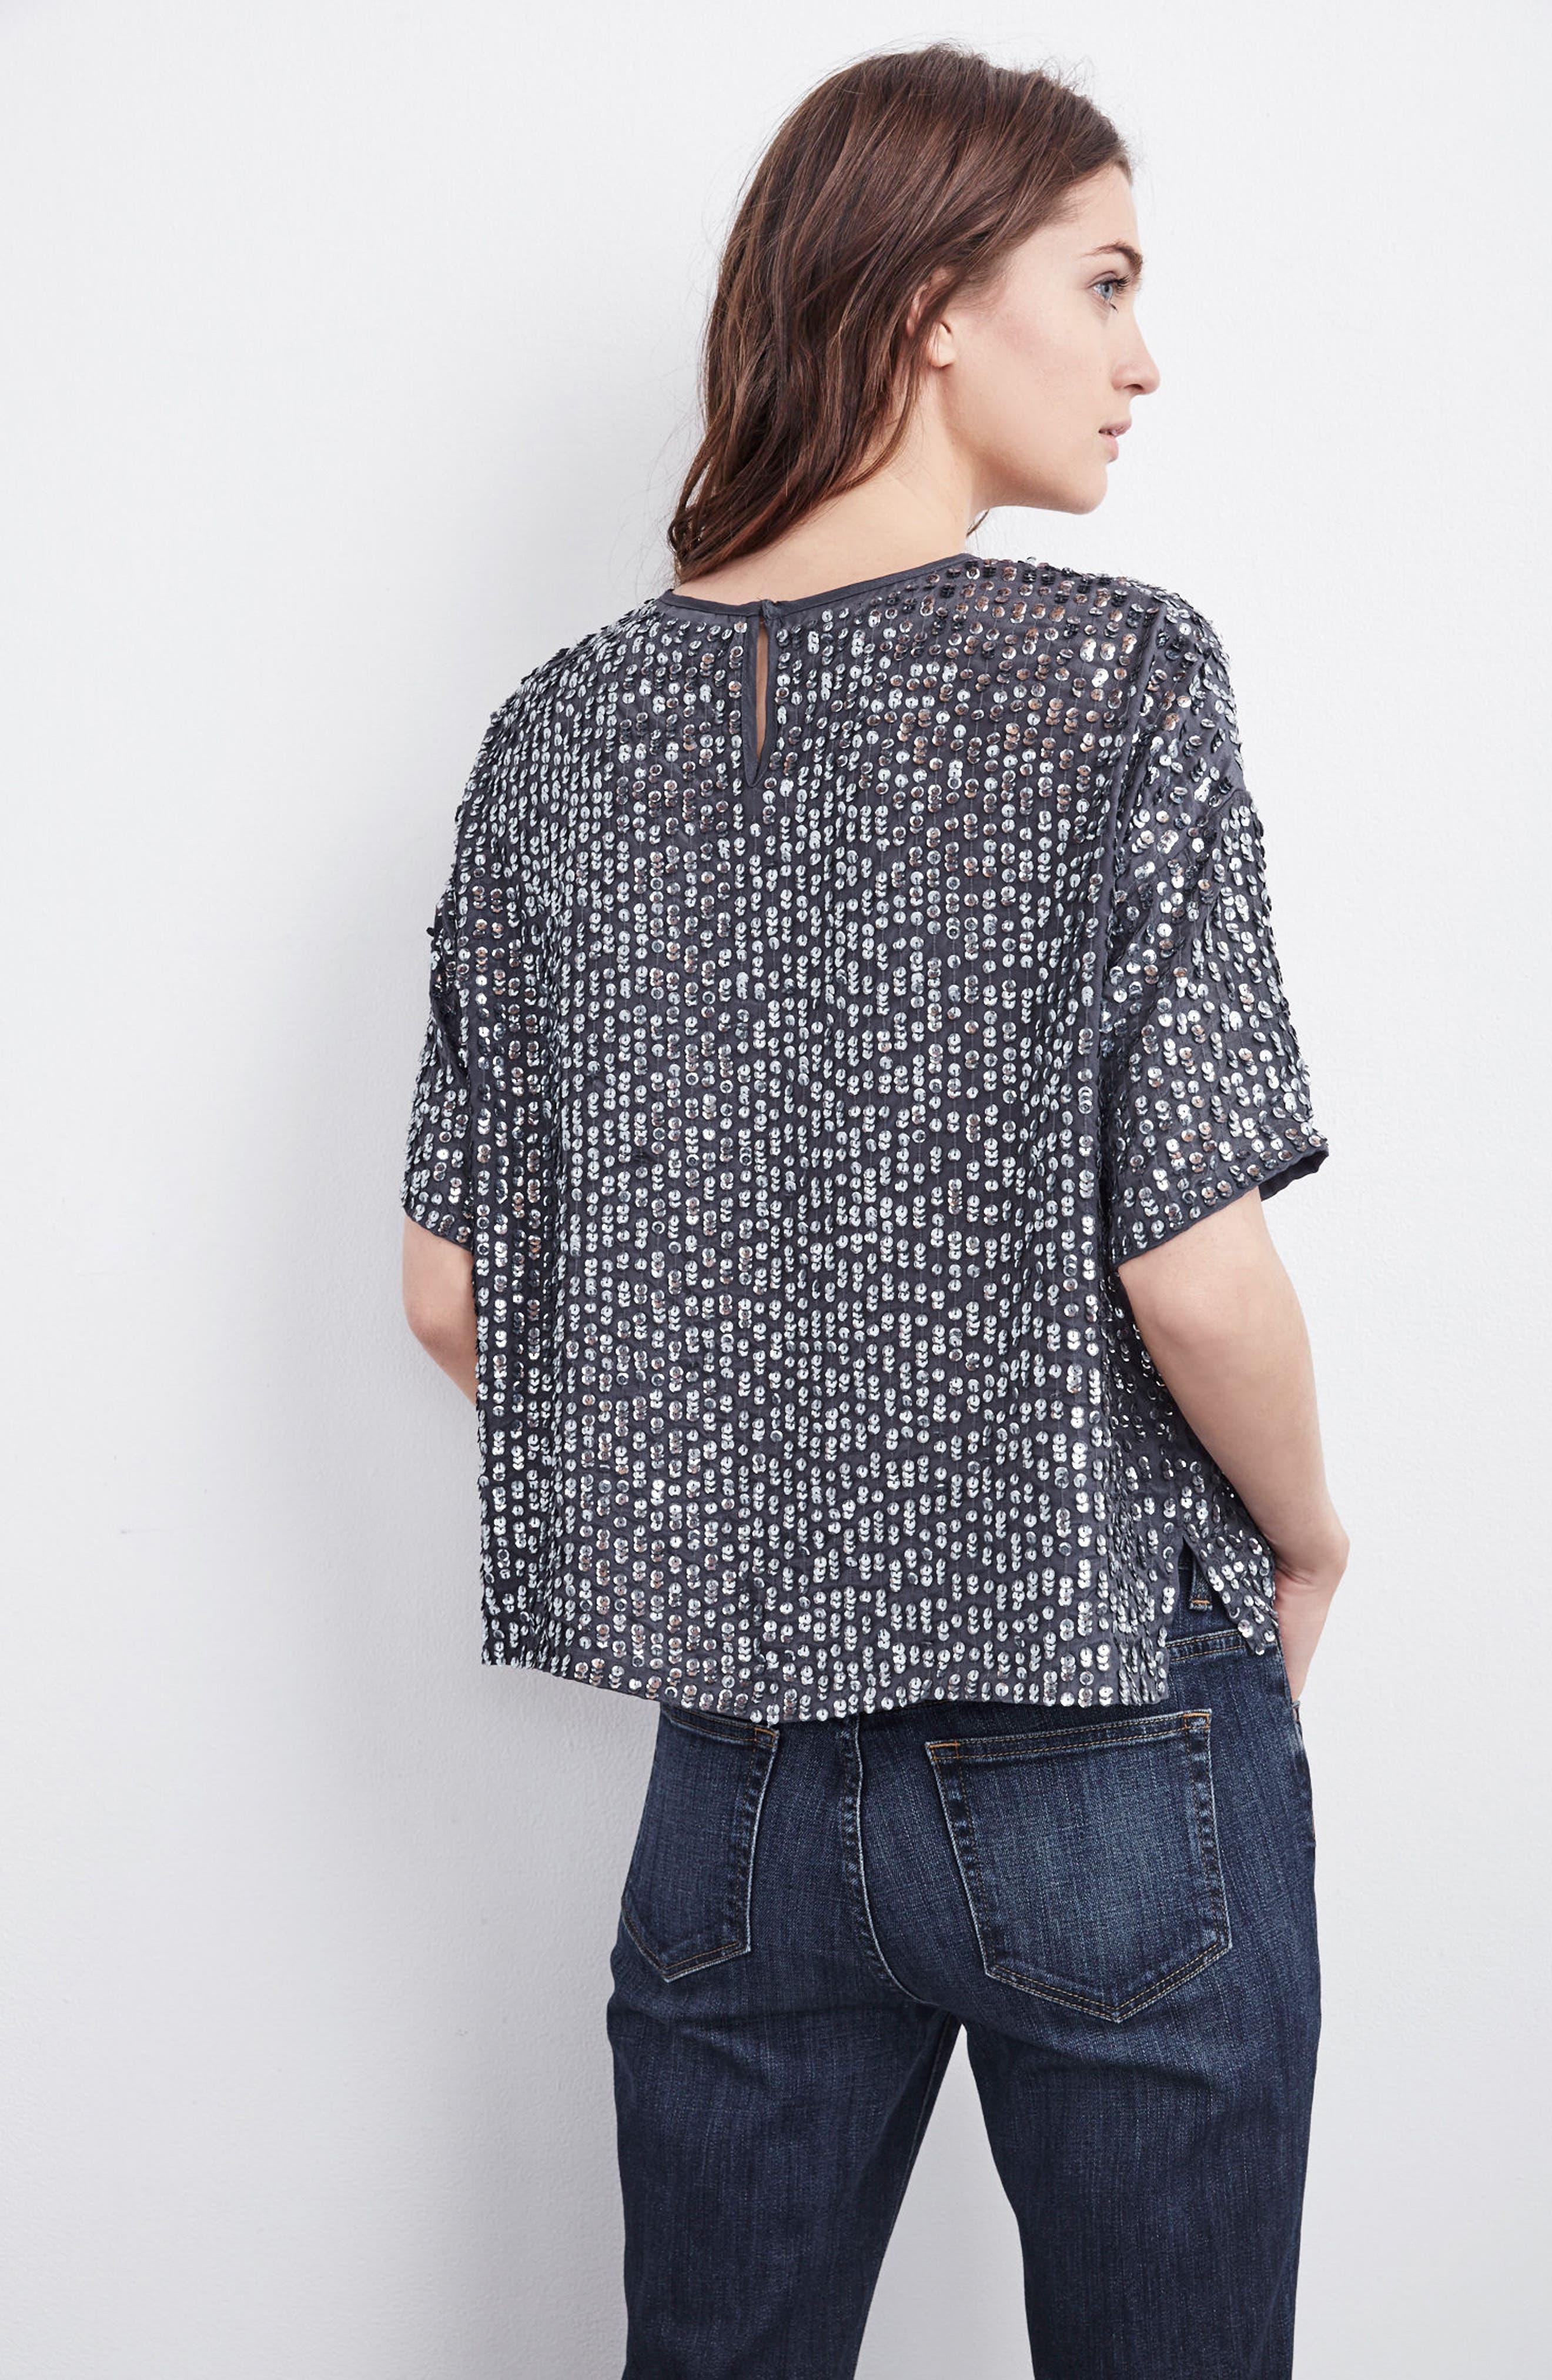 Short Sleeve Sequin Top,                             Alternate thumbnail 7, color,                             031